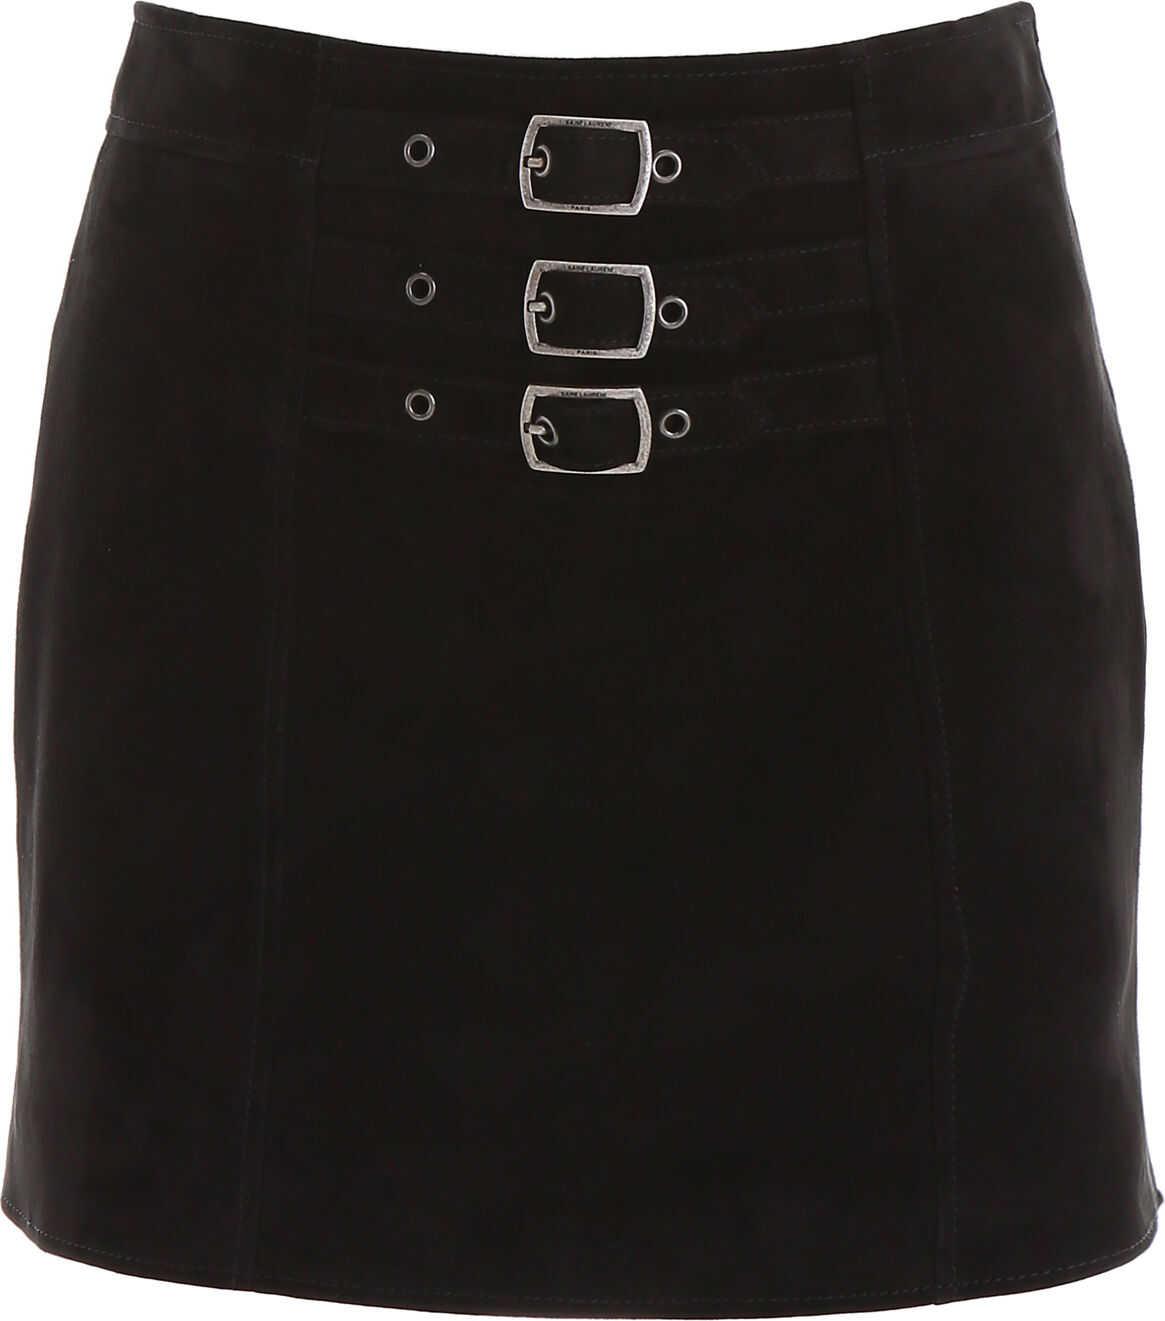 Saint Laurent Suede Mini Skirt BLACK